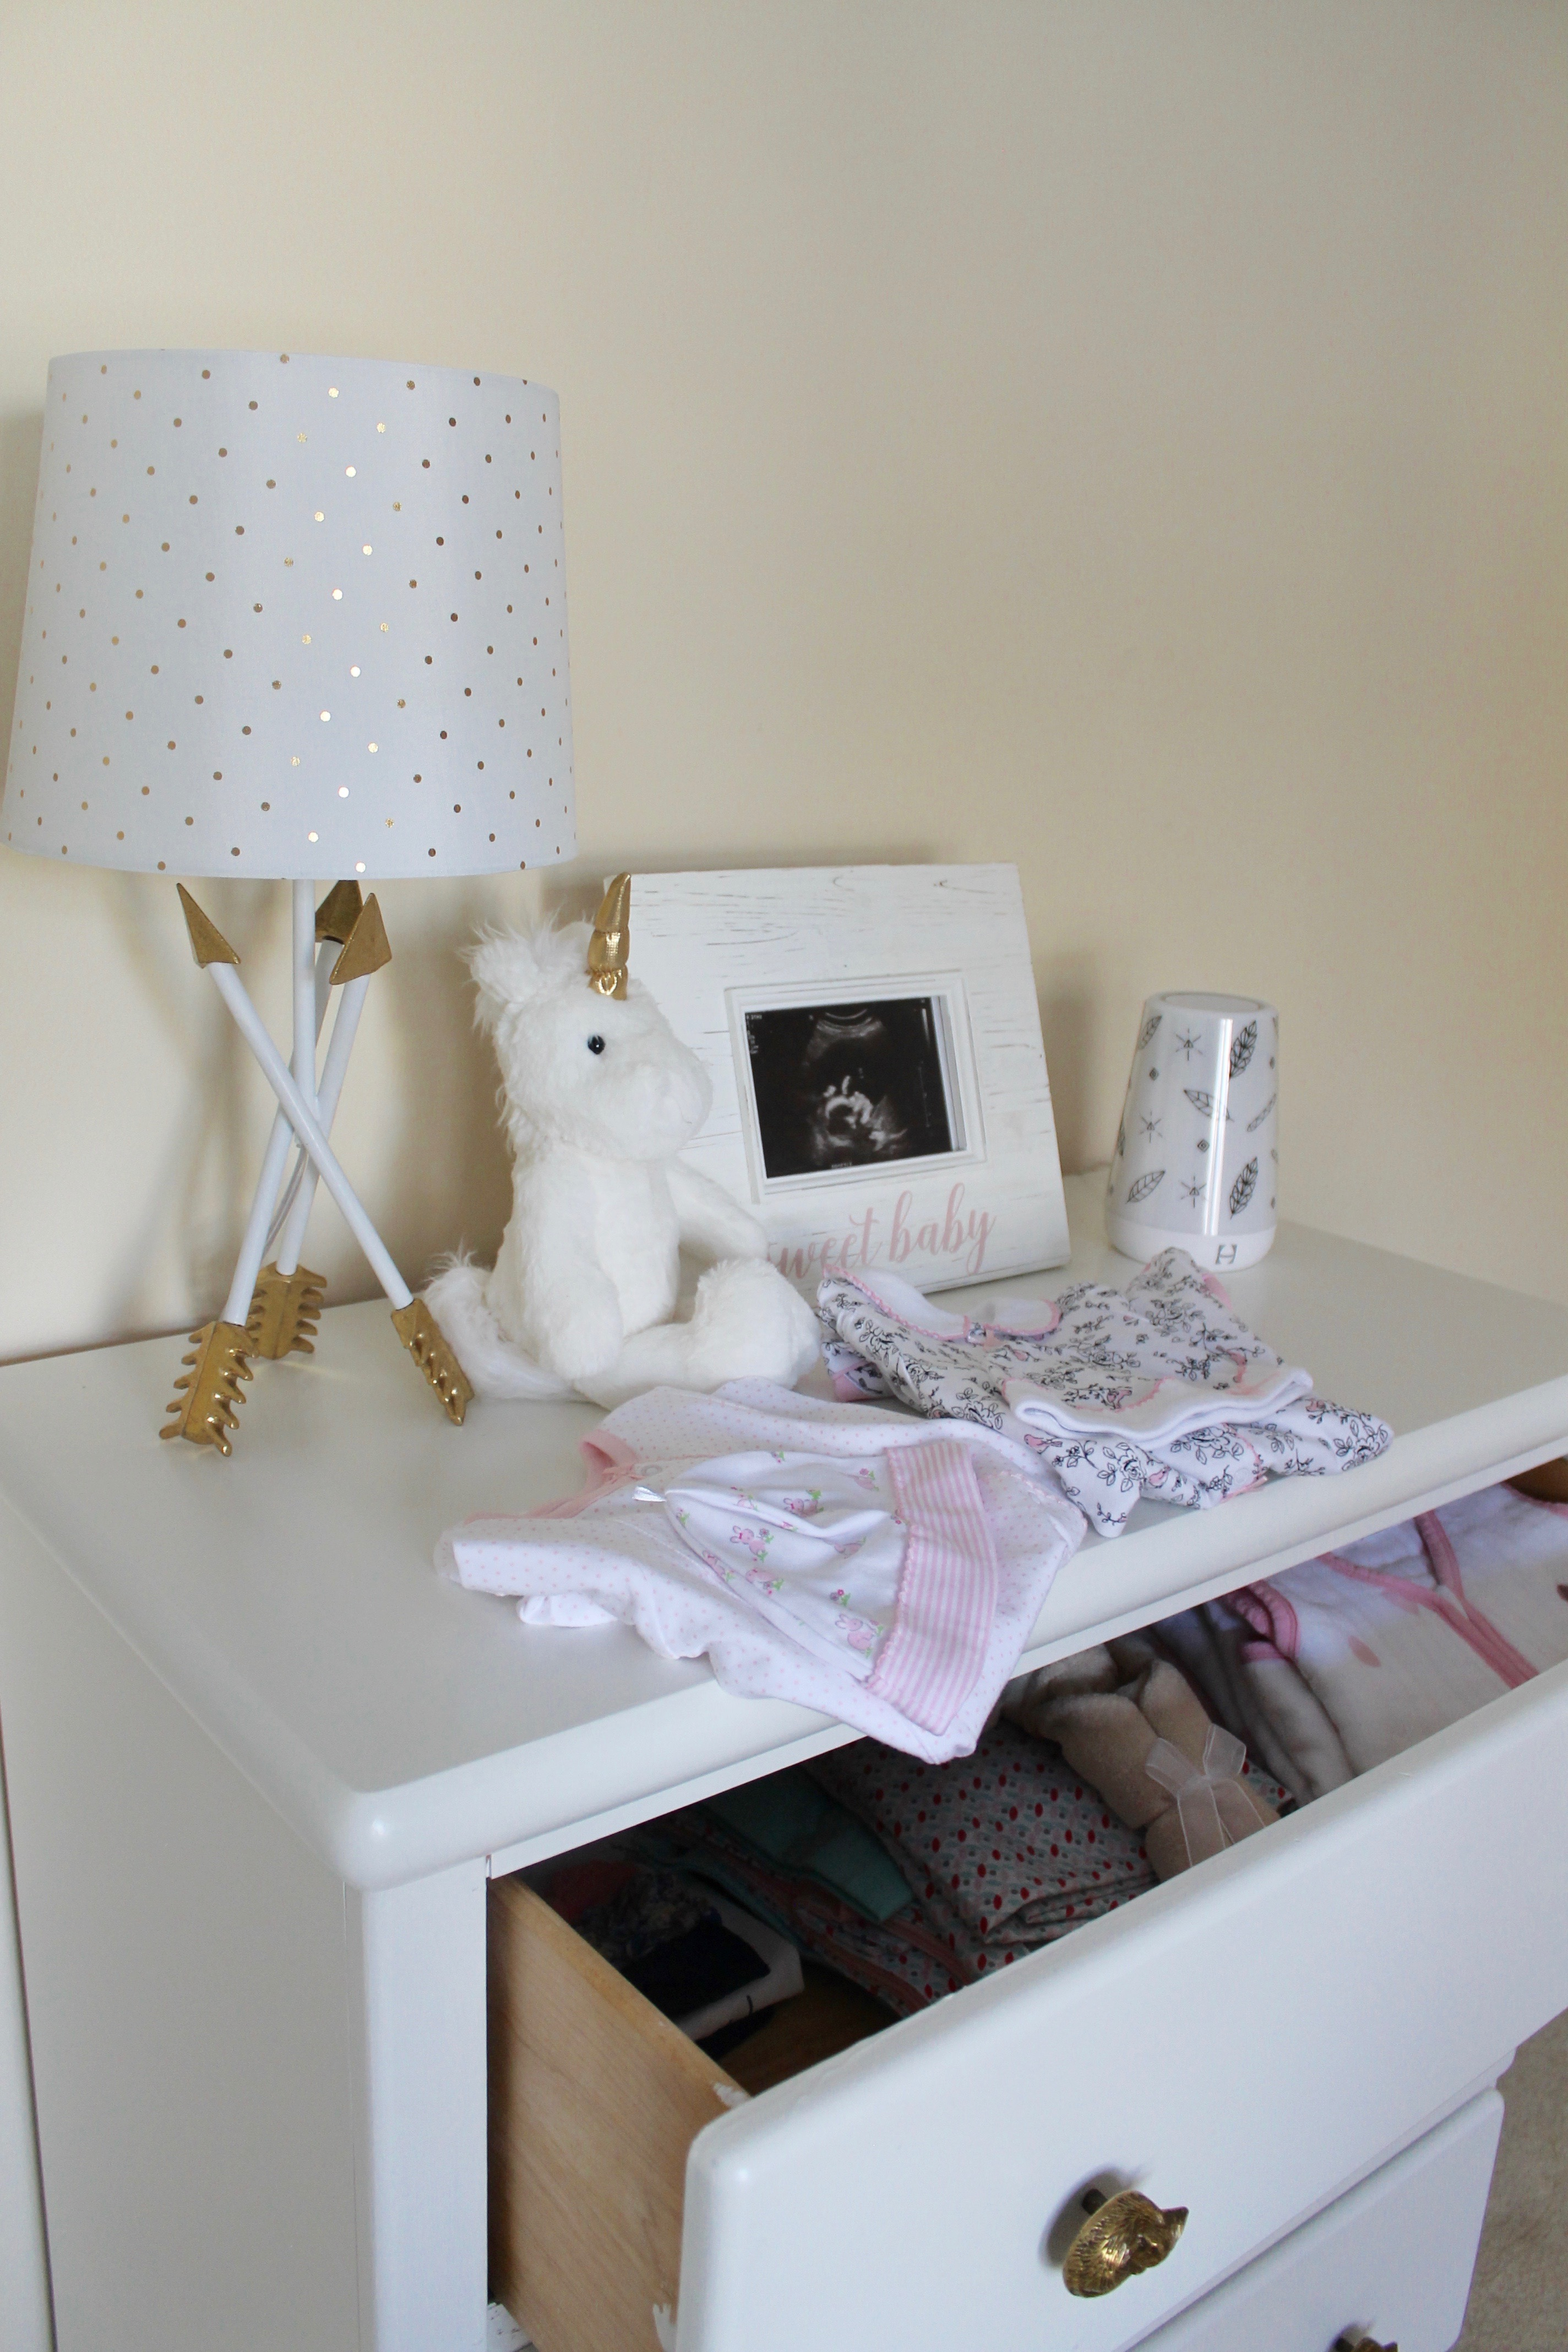 Simple bedroom bureau makeover for baby's nursery   Market Street Petite blog